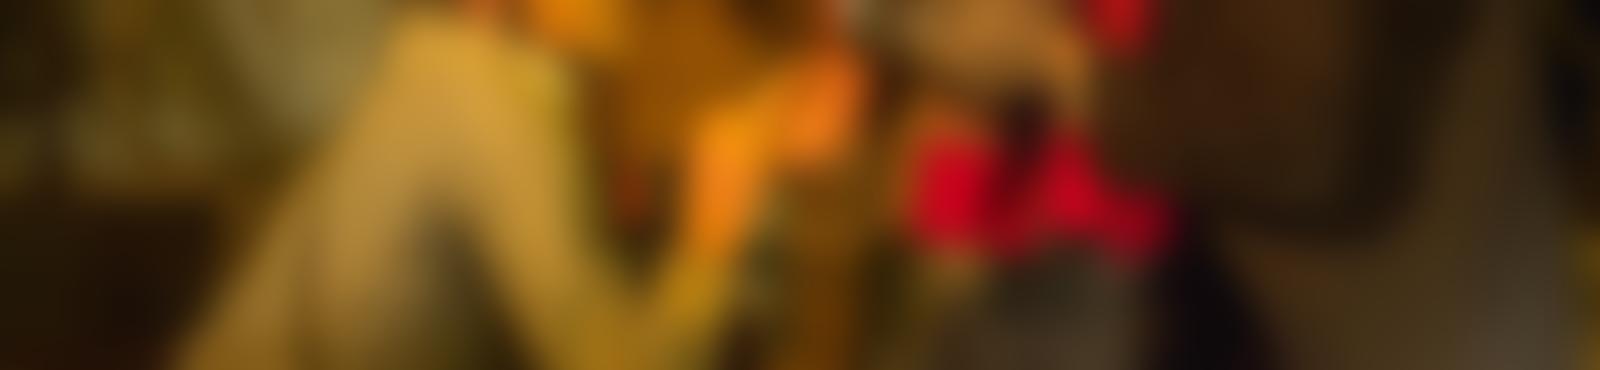 Blurred 6dc97621 e37c 4068 a395 7ef773446b81